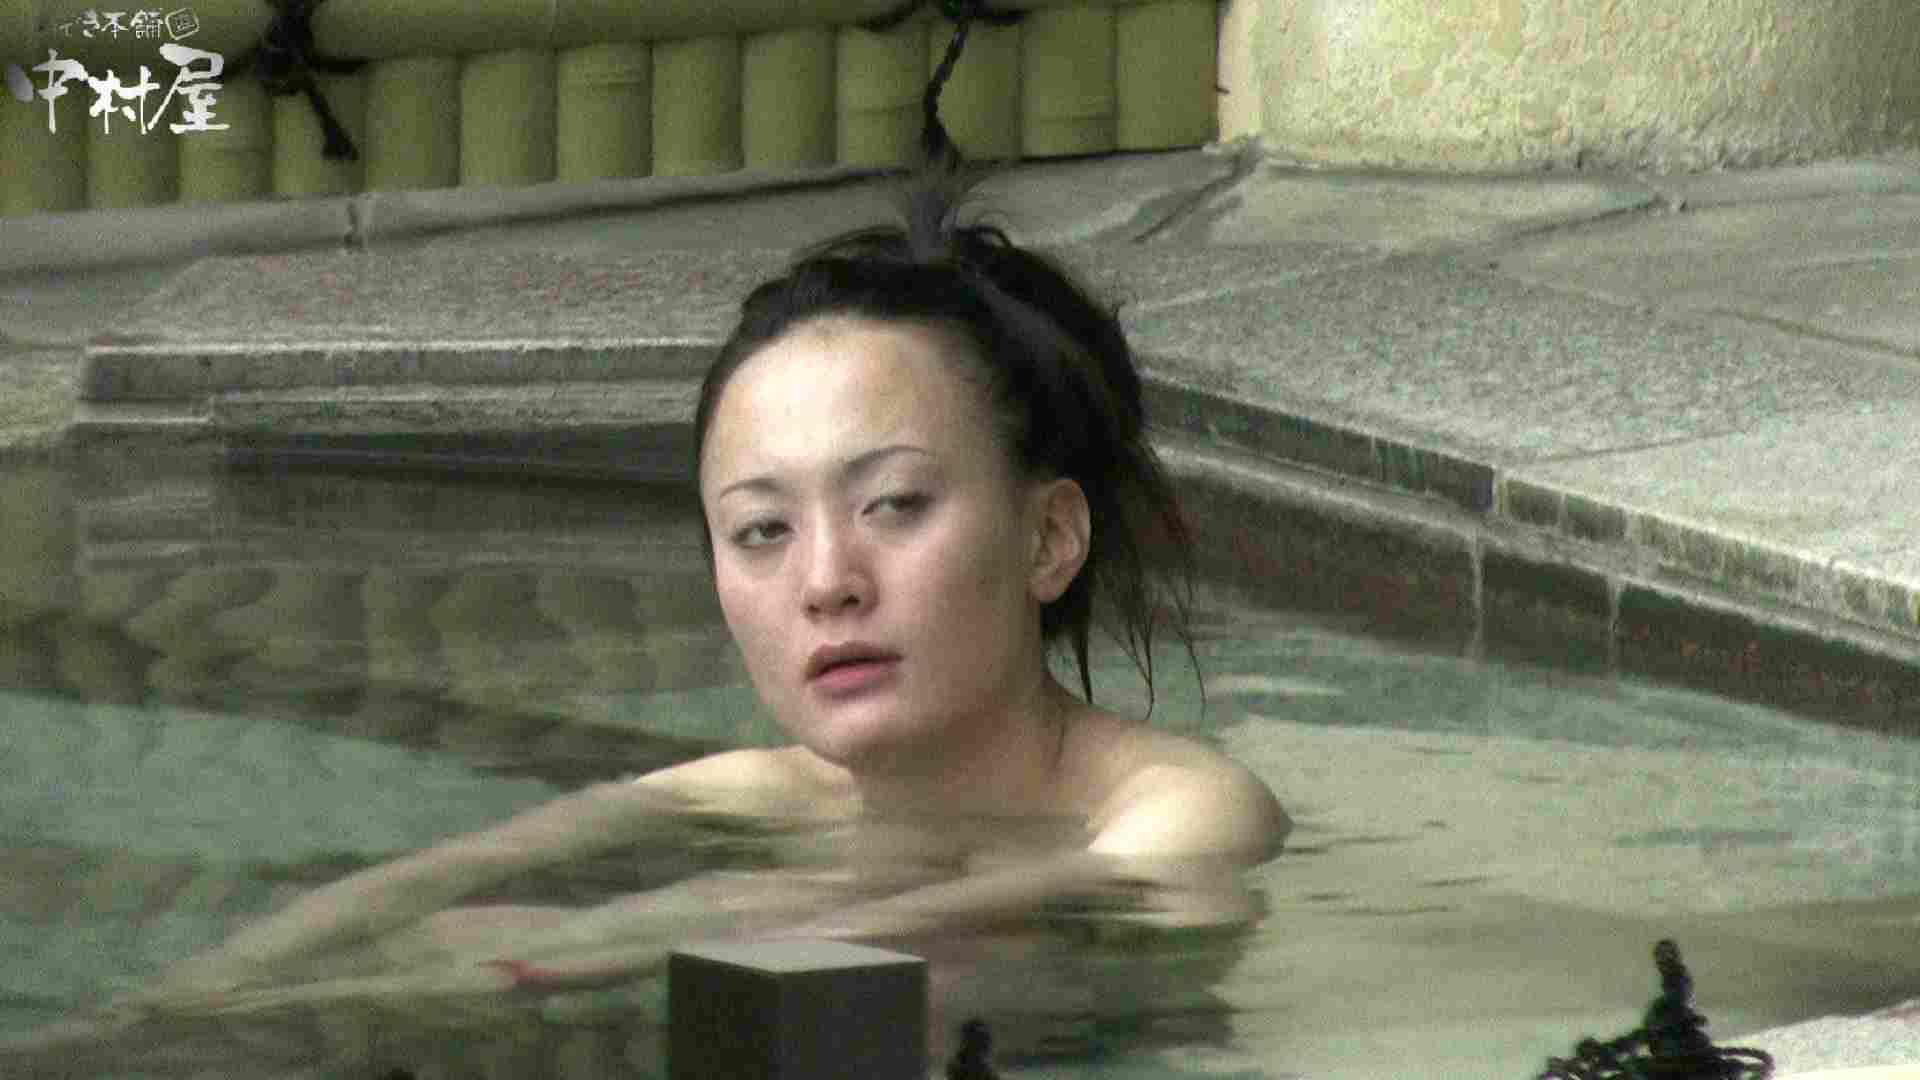 Aquaな露天風呂Vol.900 美しいOLの裸体   露天風呂突入  86pic 49